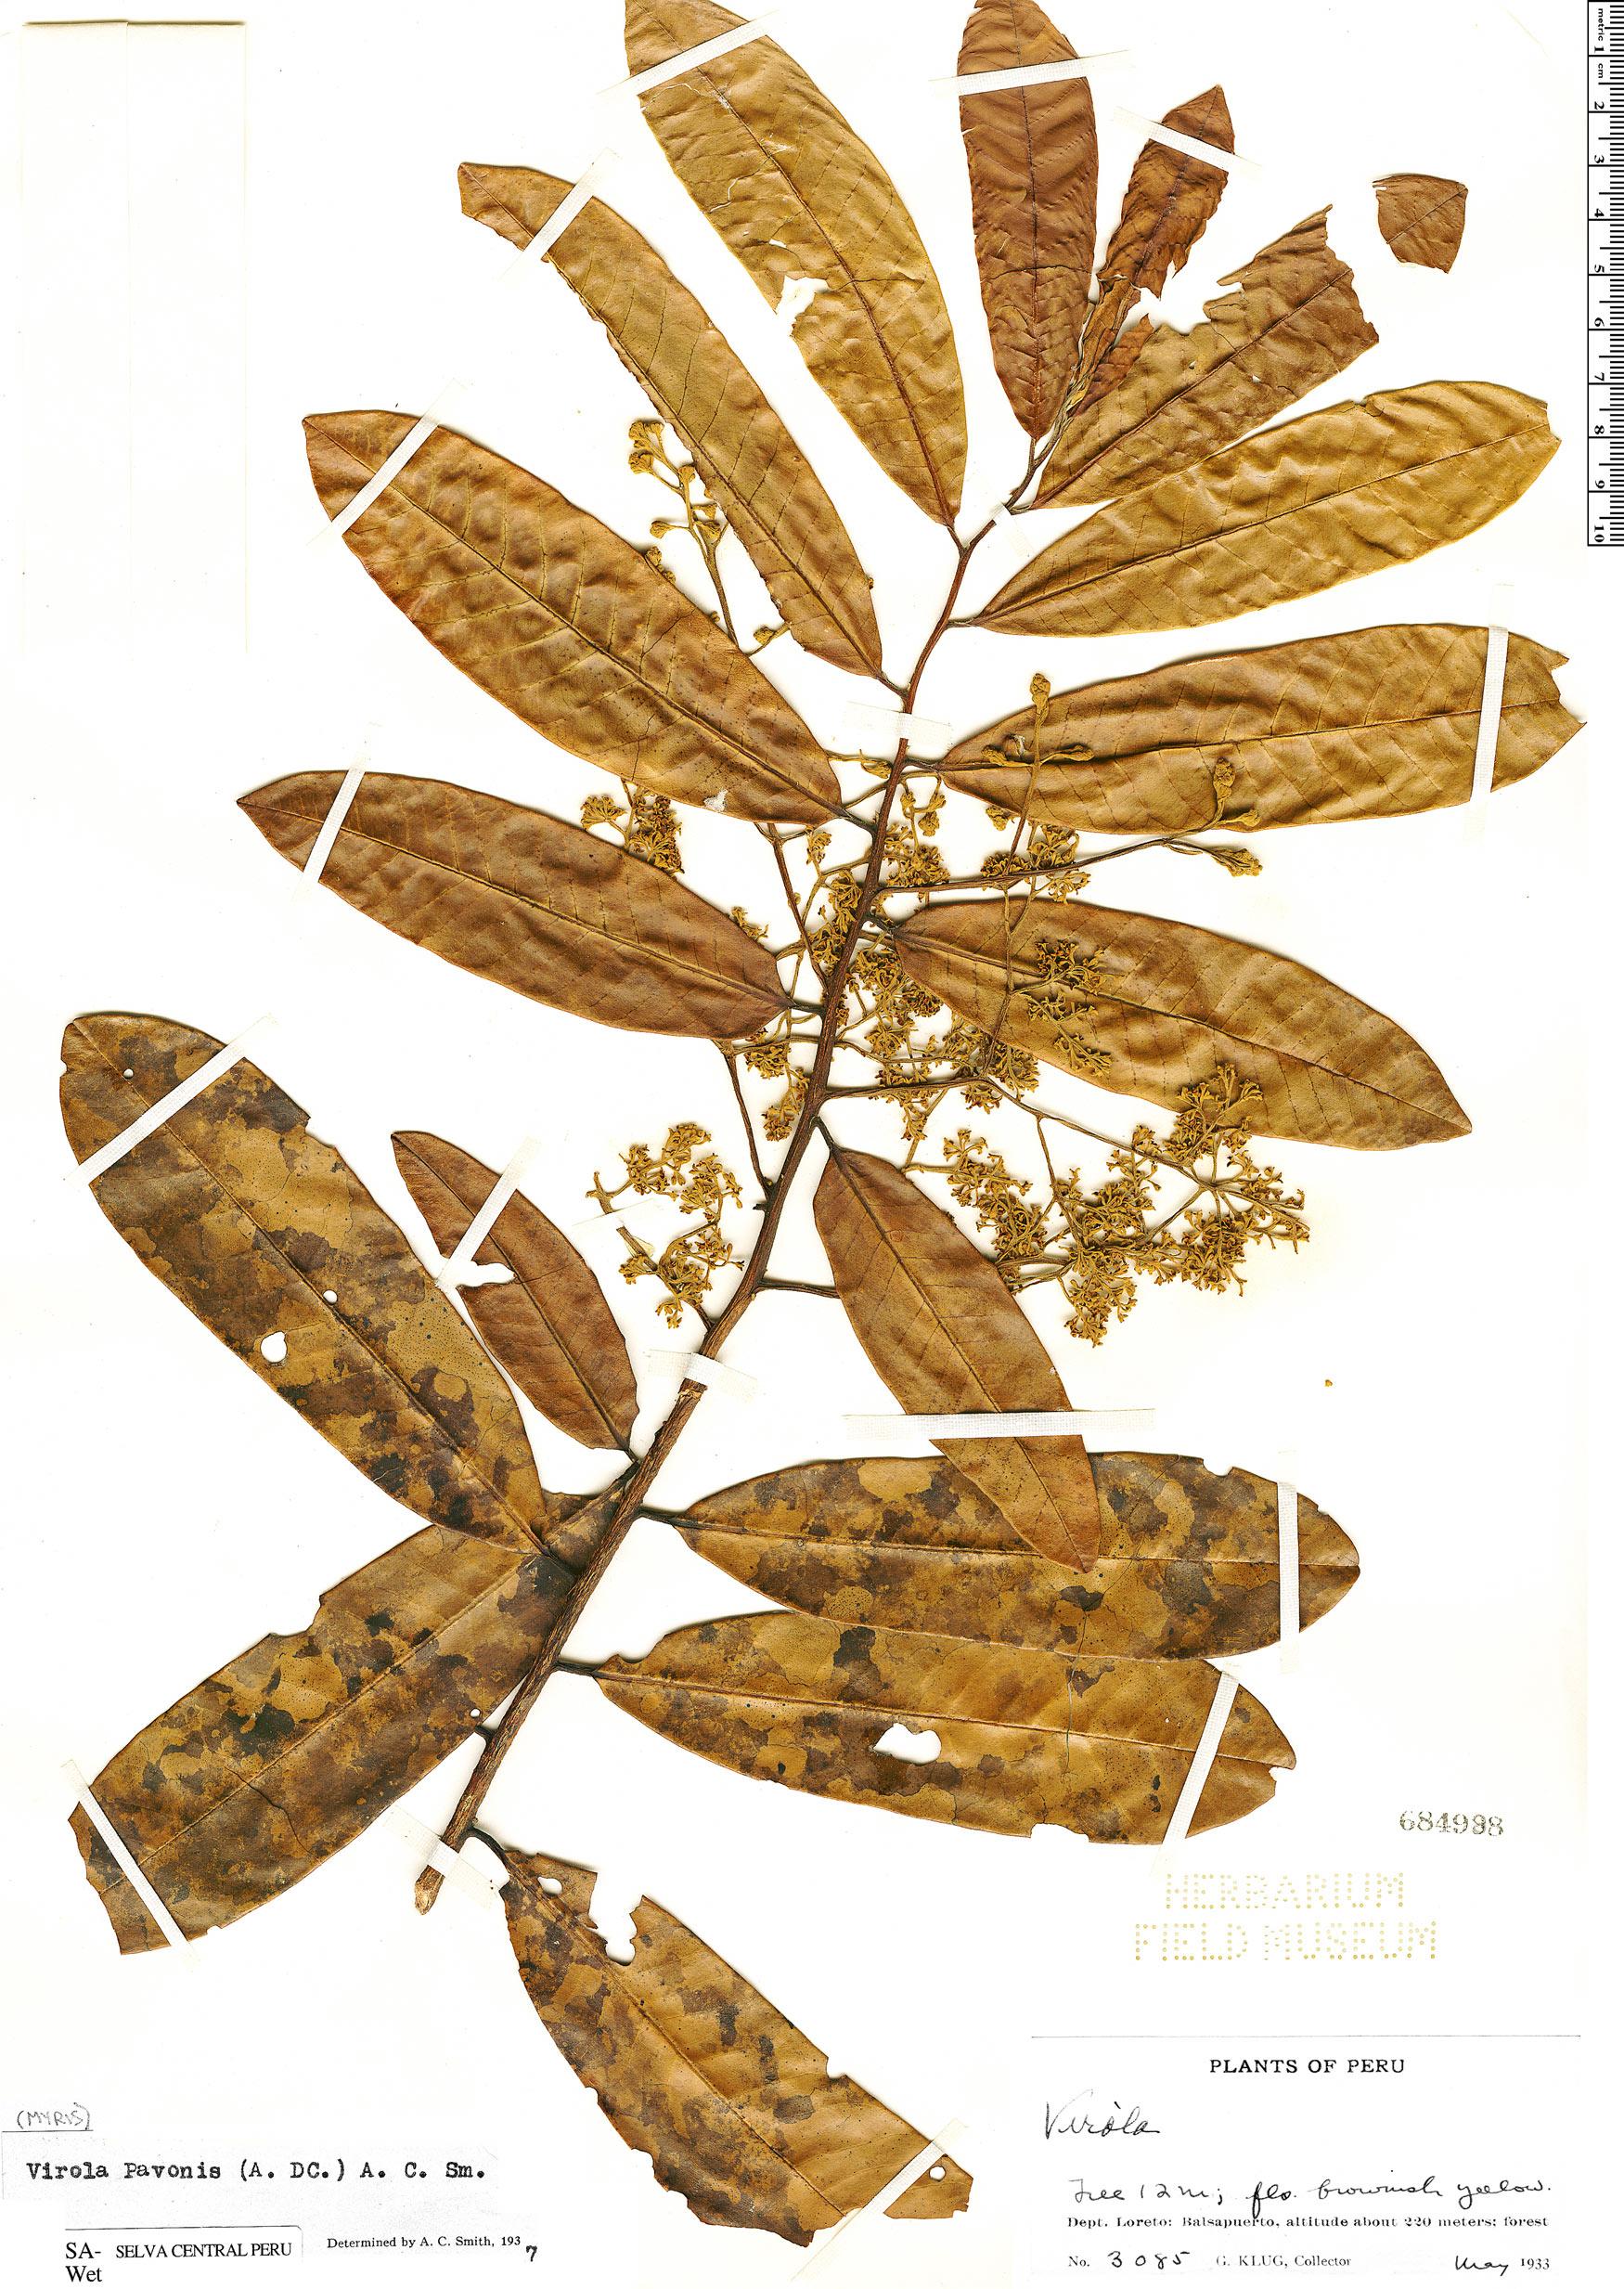 Specimen: Virola pavonis